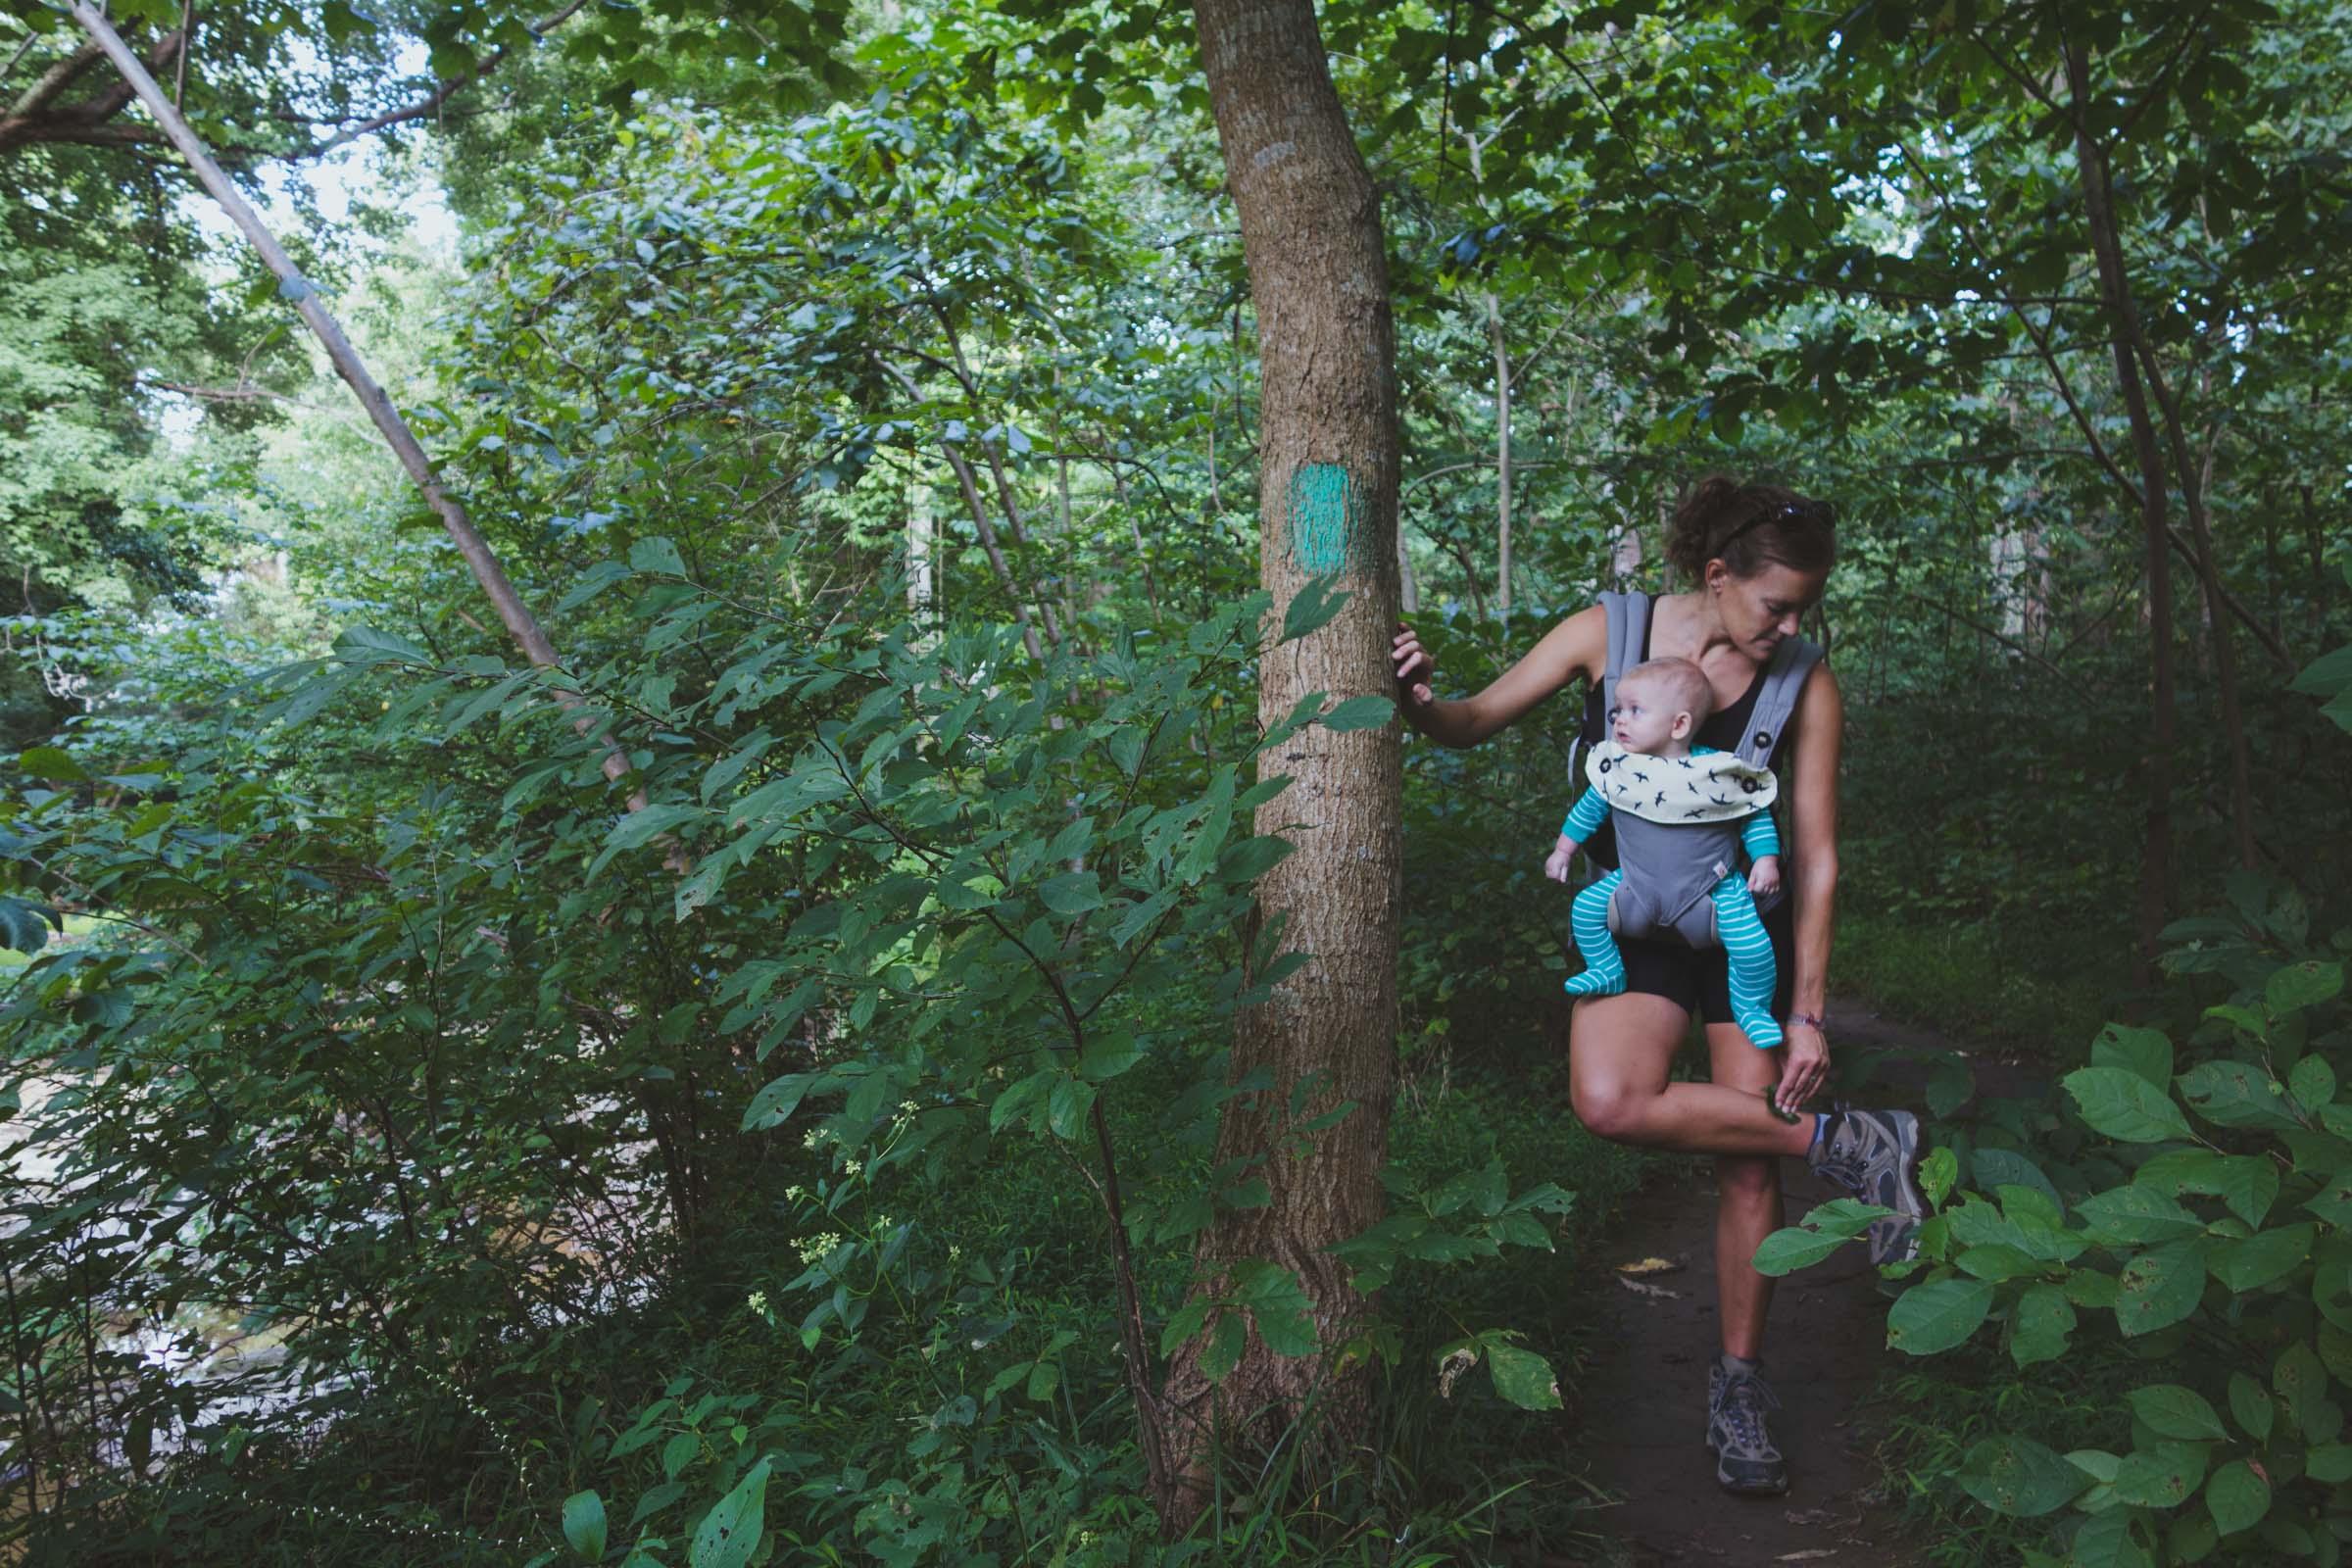 Erin & Noah. September 2017. Scott's Run Nature Preserve.